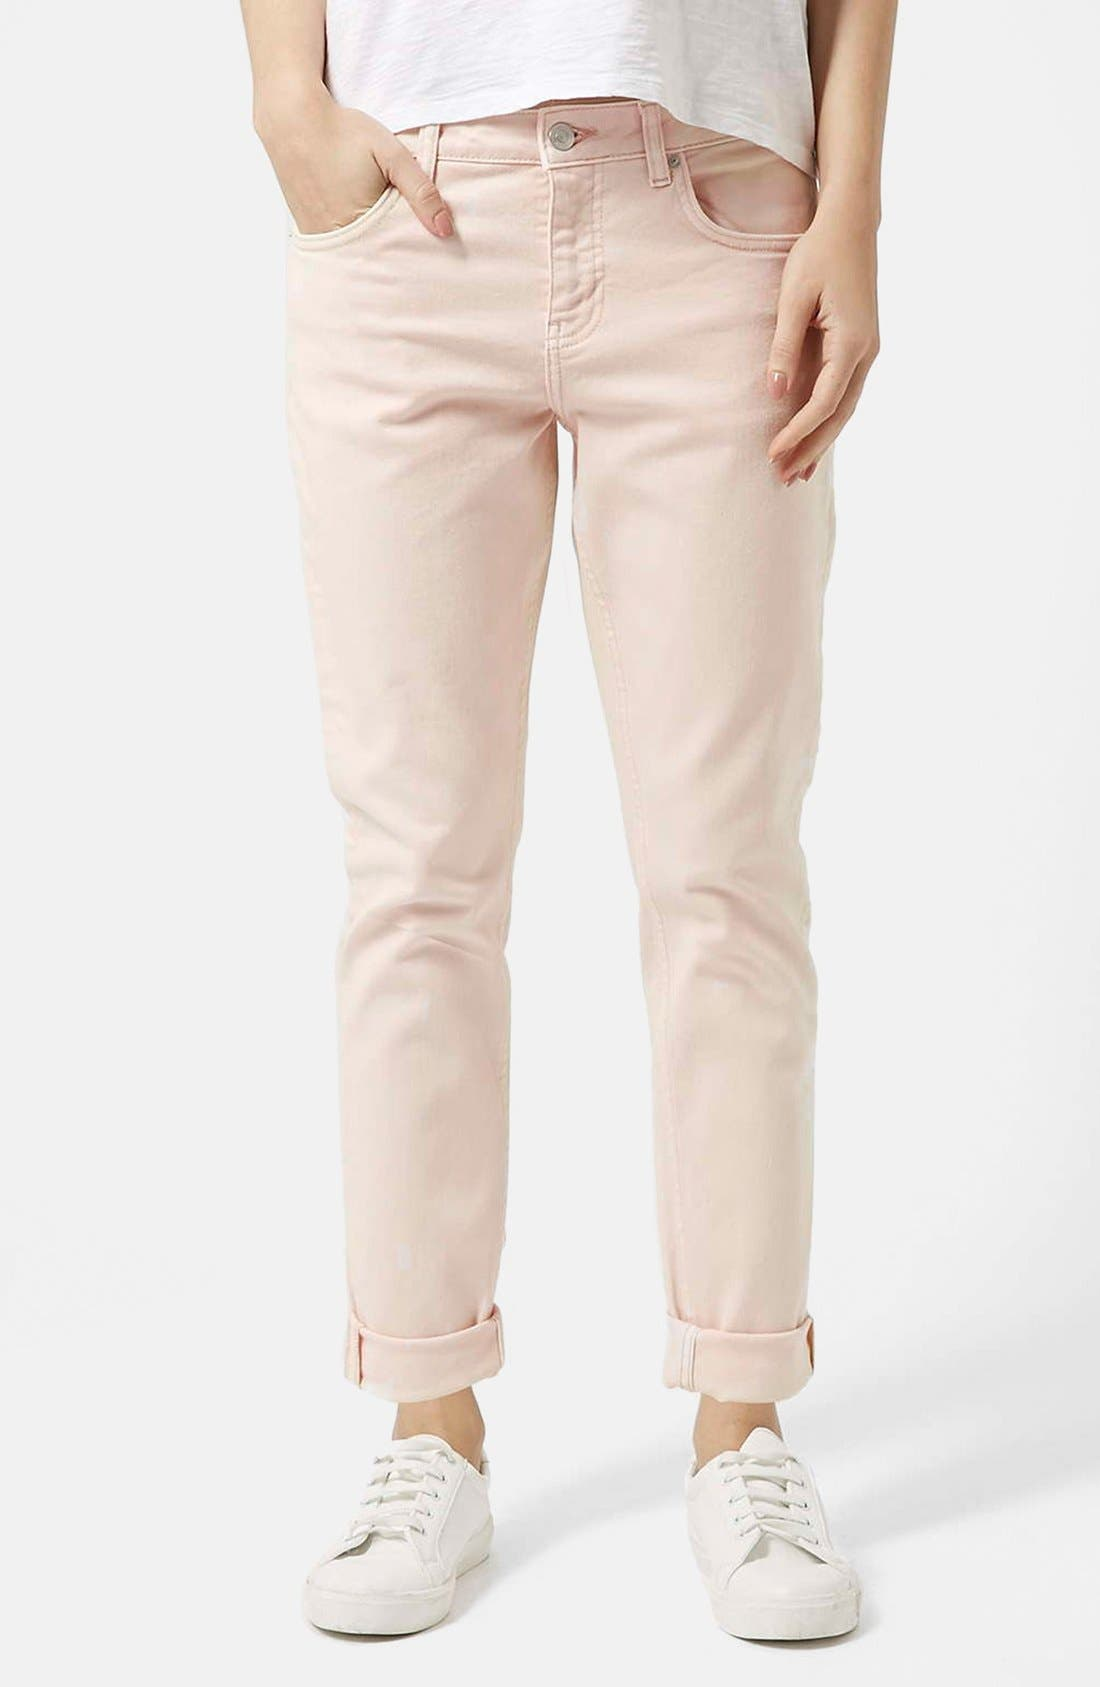 Alternate Image 1 Selected - Topshop Moto 'Lucas' Boyfriend Jeans (Pink)